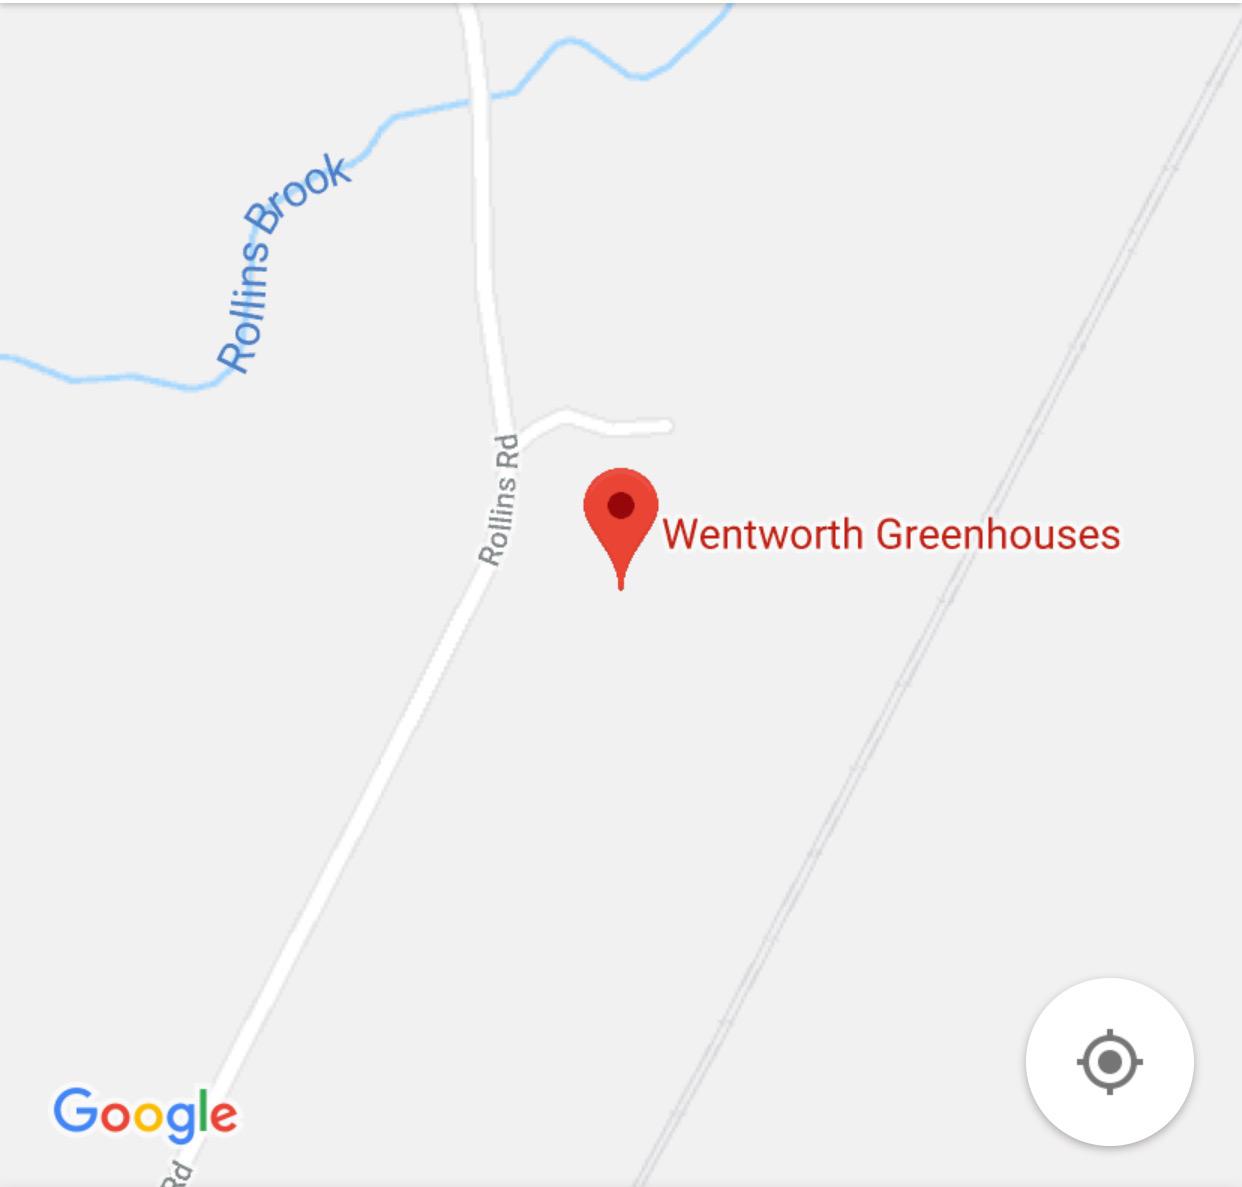 Wentworth Greenhouses Winter Farmer's Market - Saturdays 10:00 am -2:00 pm (Check Dates Below)Wentworth Greenhouses141 Rollins RoadRollinsford NH 03869